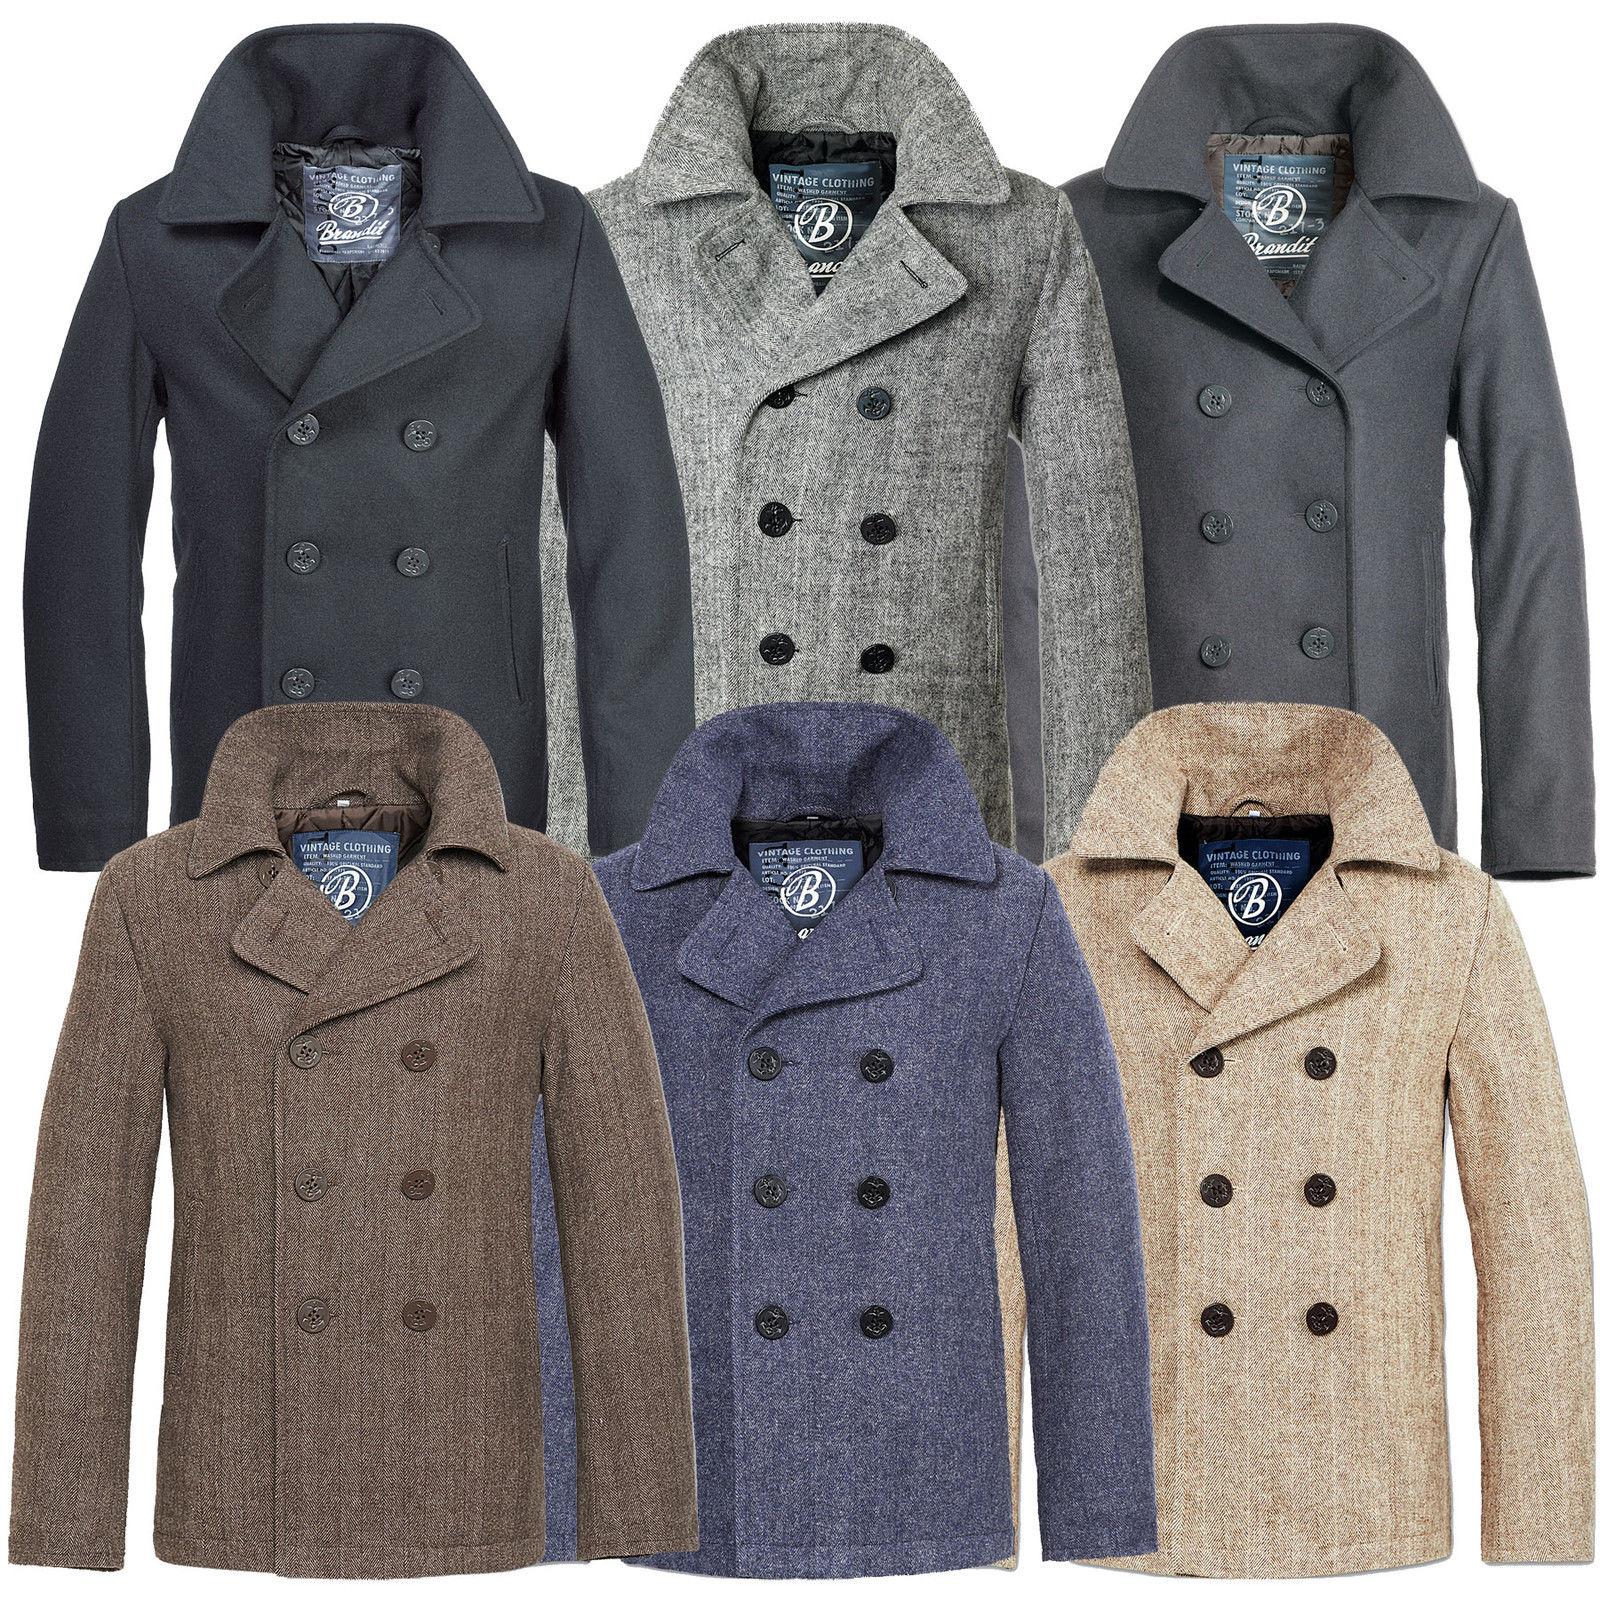 brandit pea coat marine woll mantel herren winter jacke navy caban kurzmantel. Black Bedroom Furniture Sets. Home Design Ideas